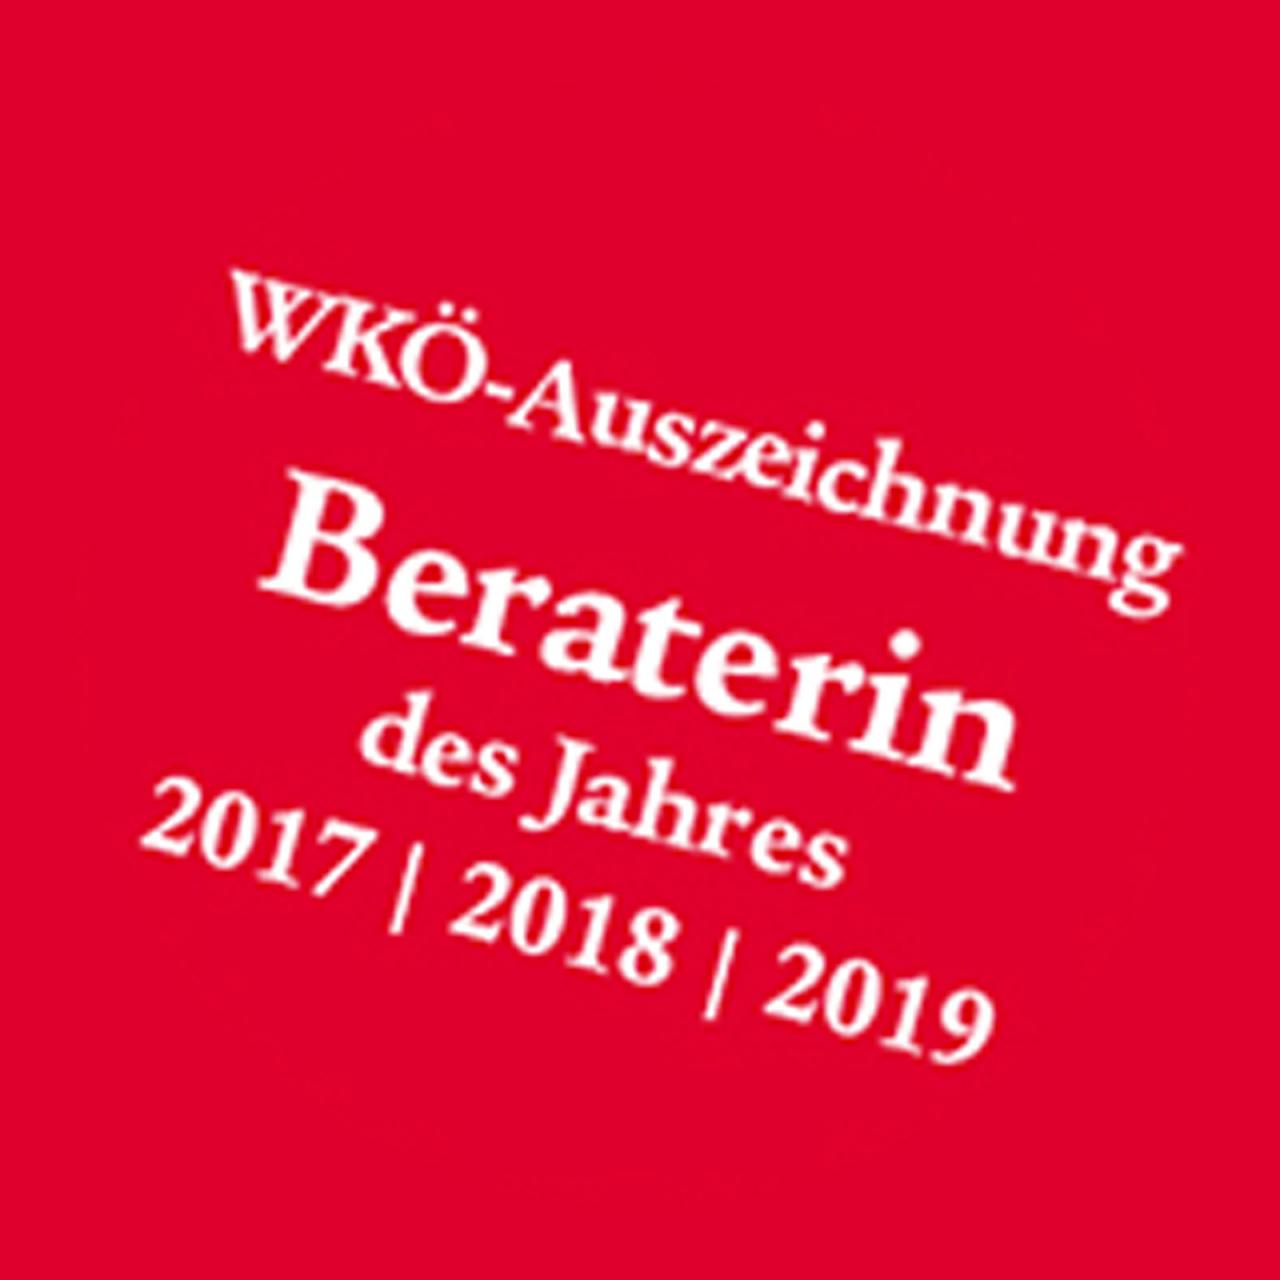 https://www.zukunfthauser.at/wp-content/uploads/2020/05/bg_sticker-1280x1280.png